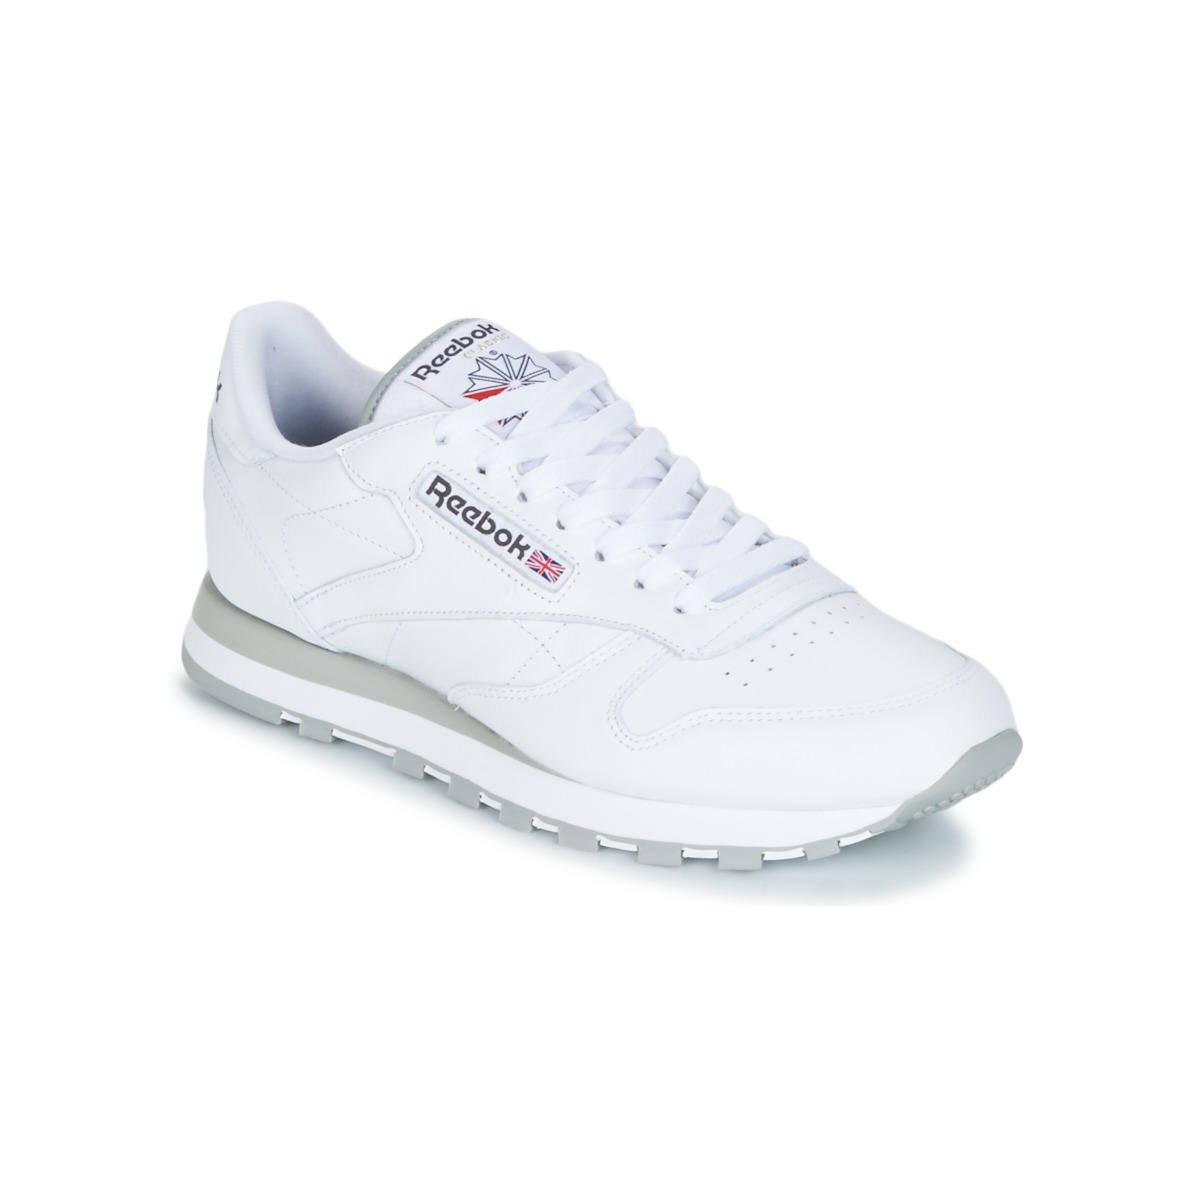 Reebok Classic CL LEATHER Weiss - Kostenloser Versand bei Spartoode ! - Schuhe Sneaker Low Herren 72,00 €